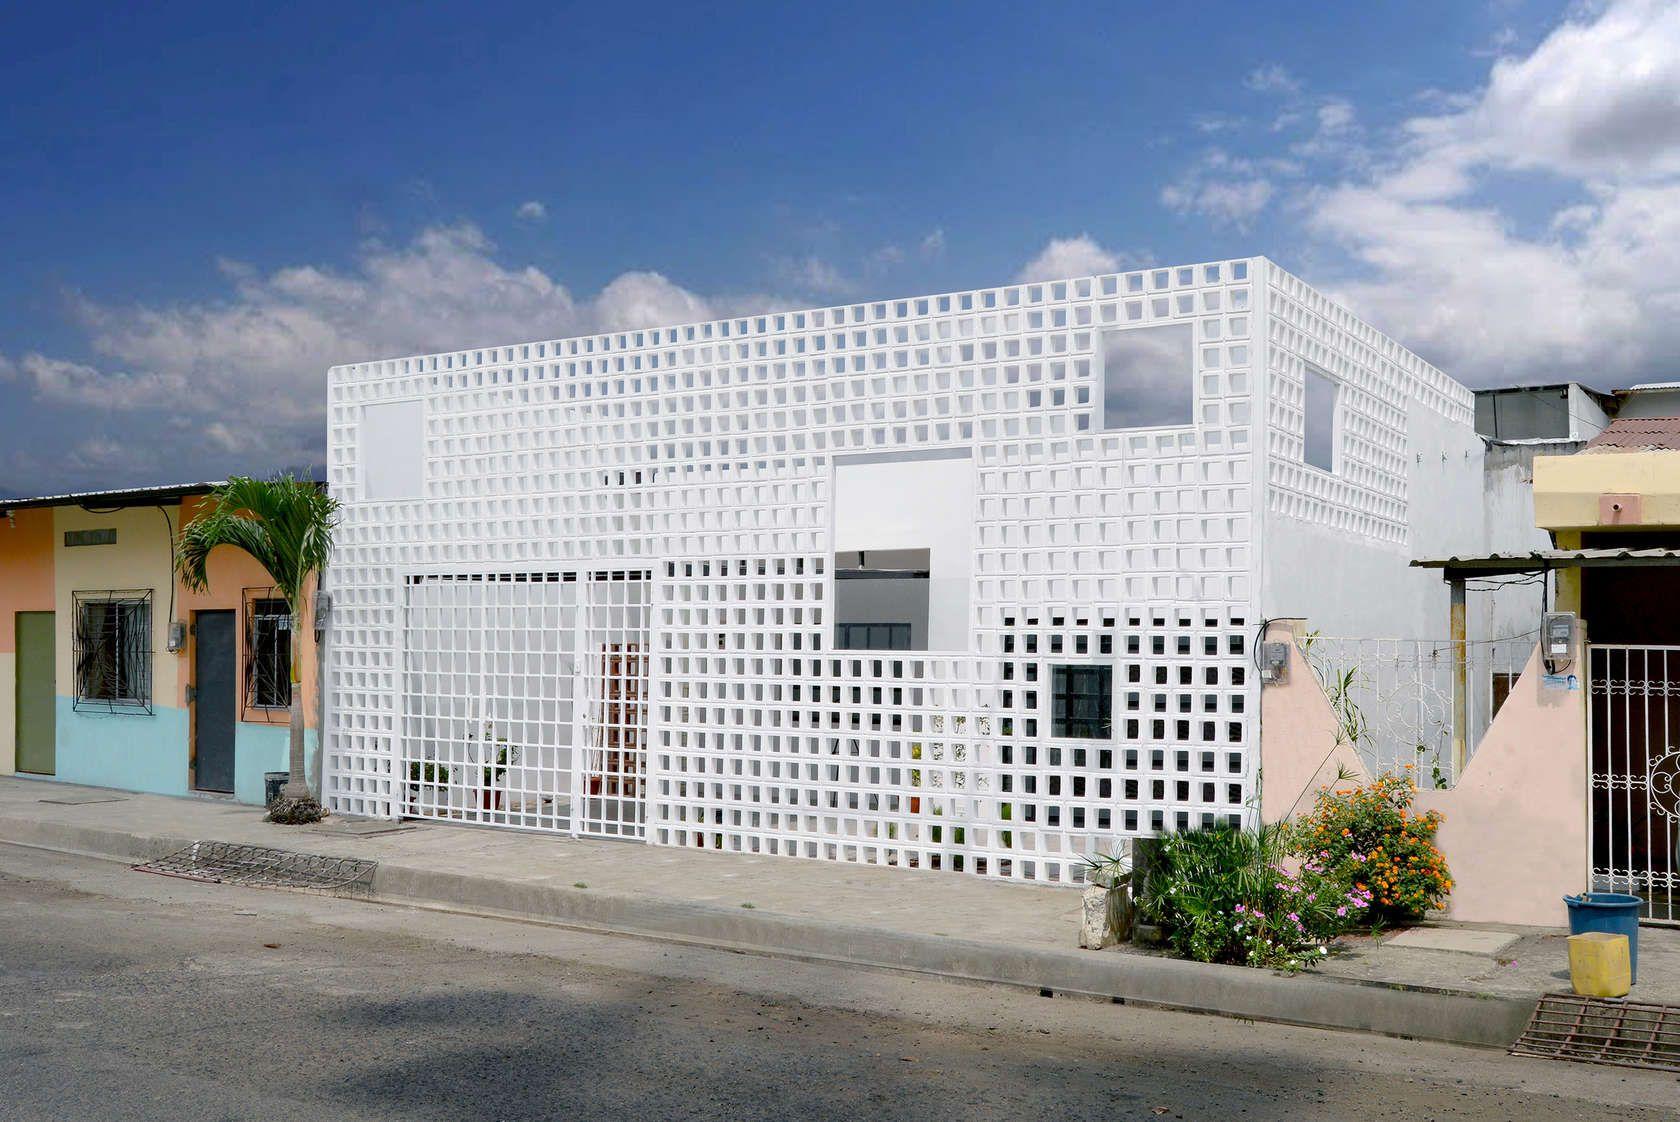 Casa infinita the house as experiential place by natura futura arquitectura ecuador mediterranean architecture